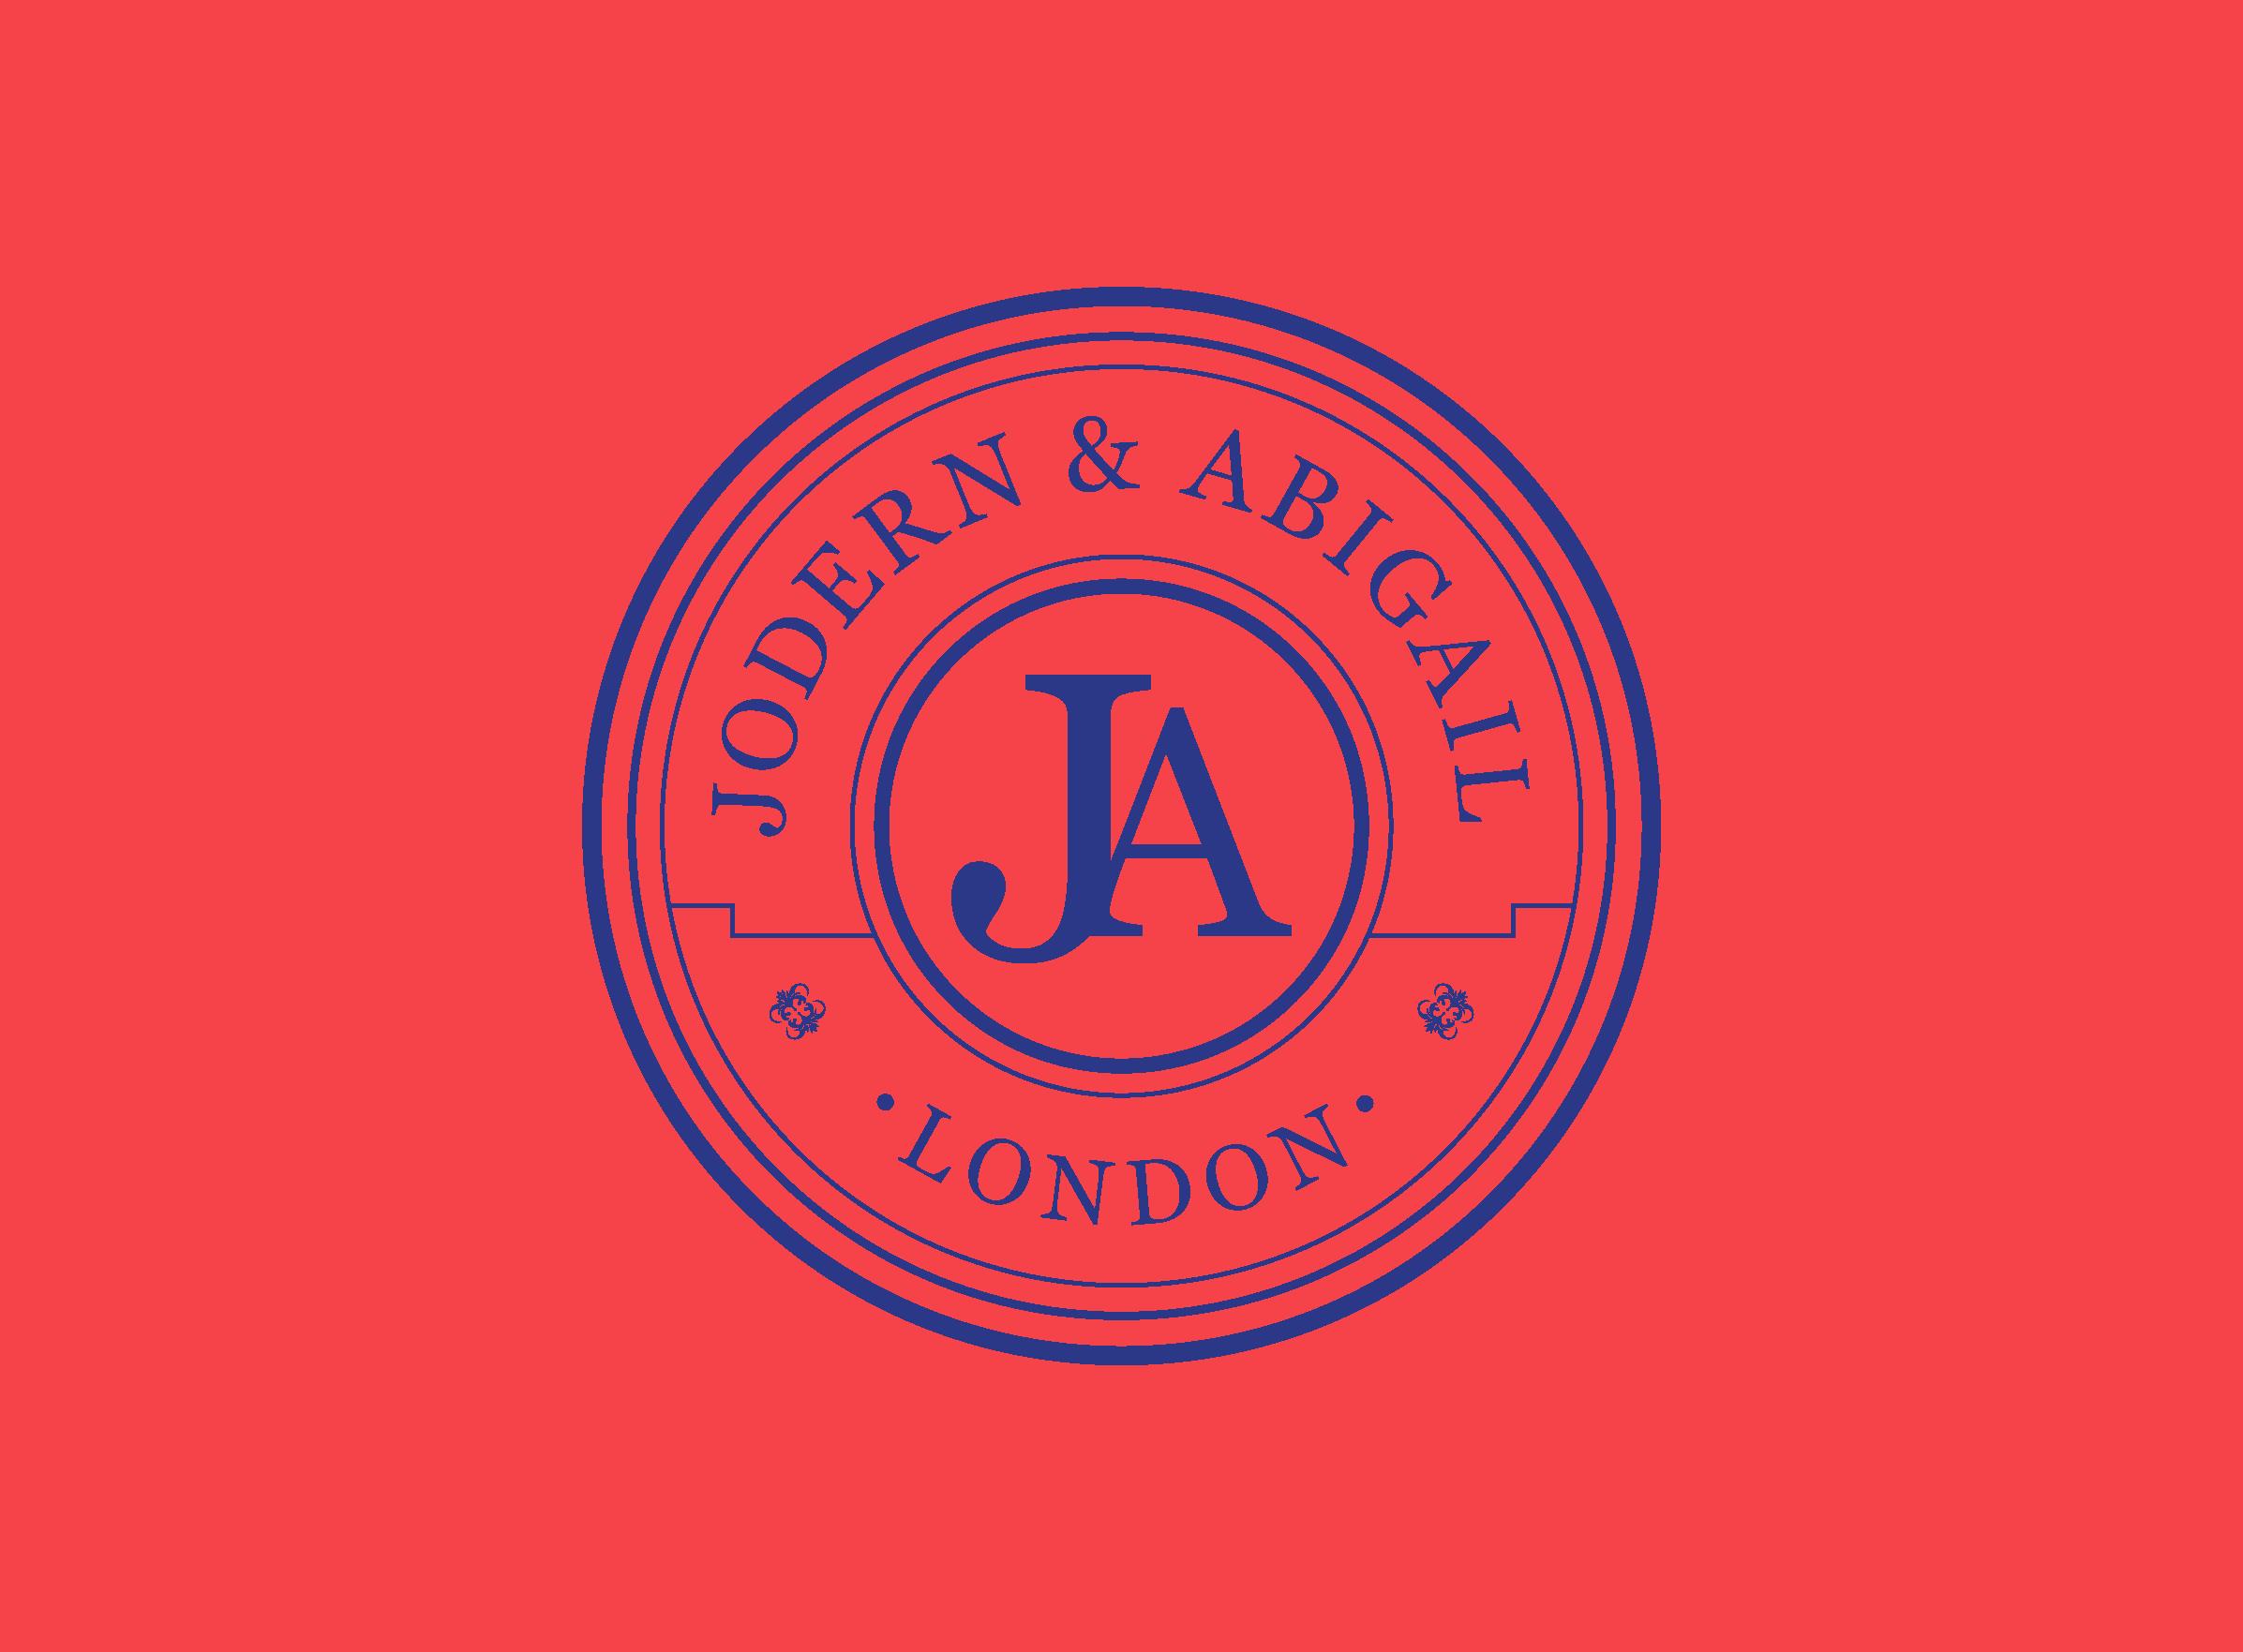 Jodern & Abigail